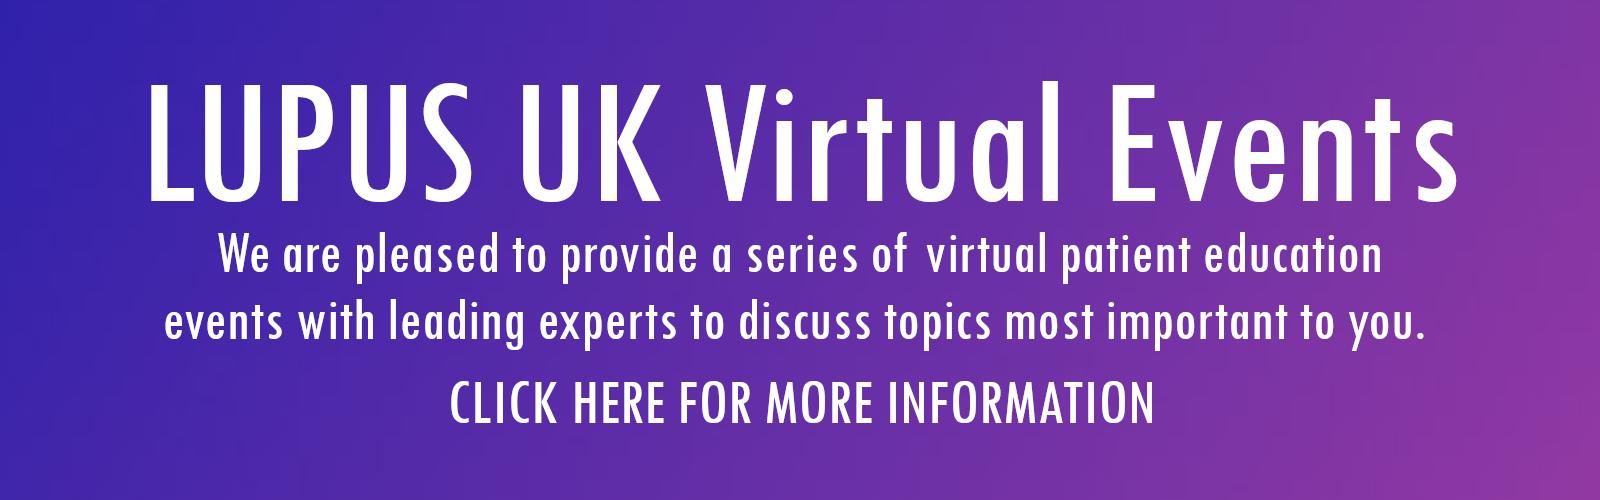 Virtual-Seminar-Image-1